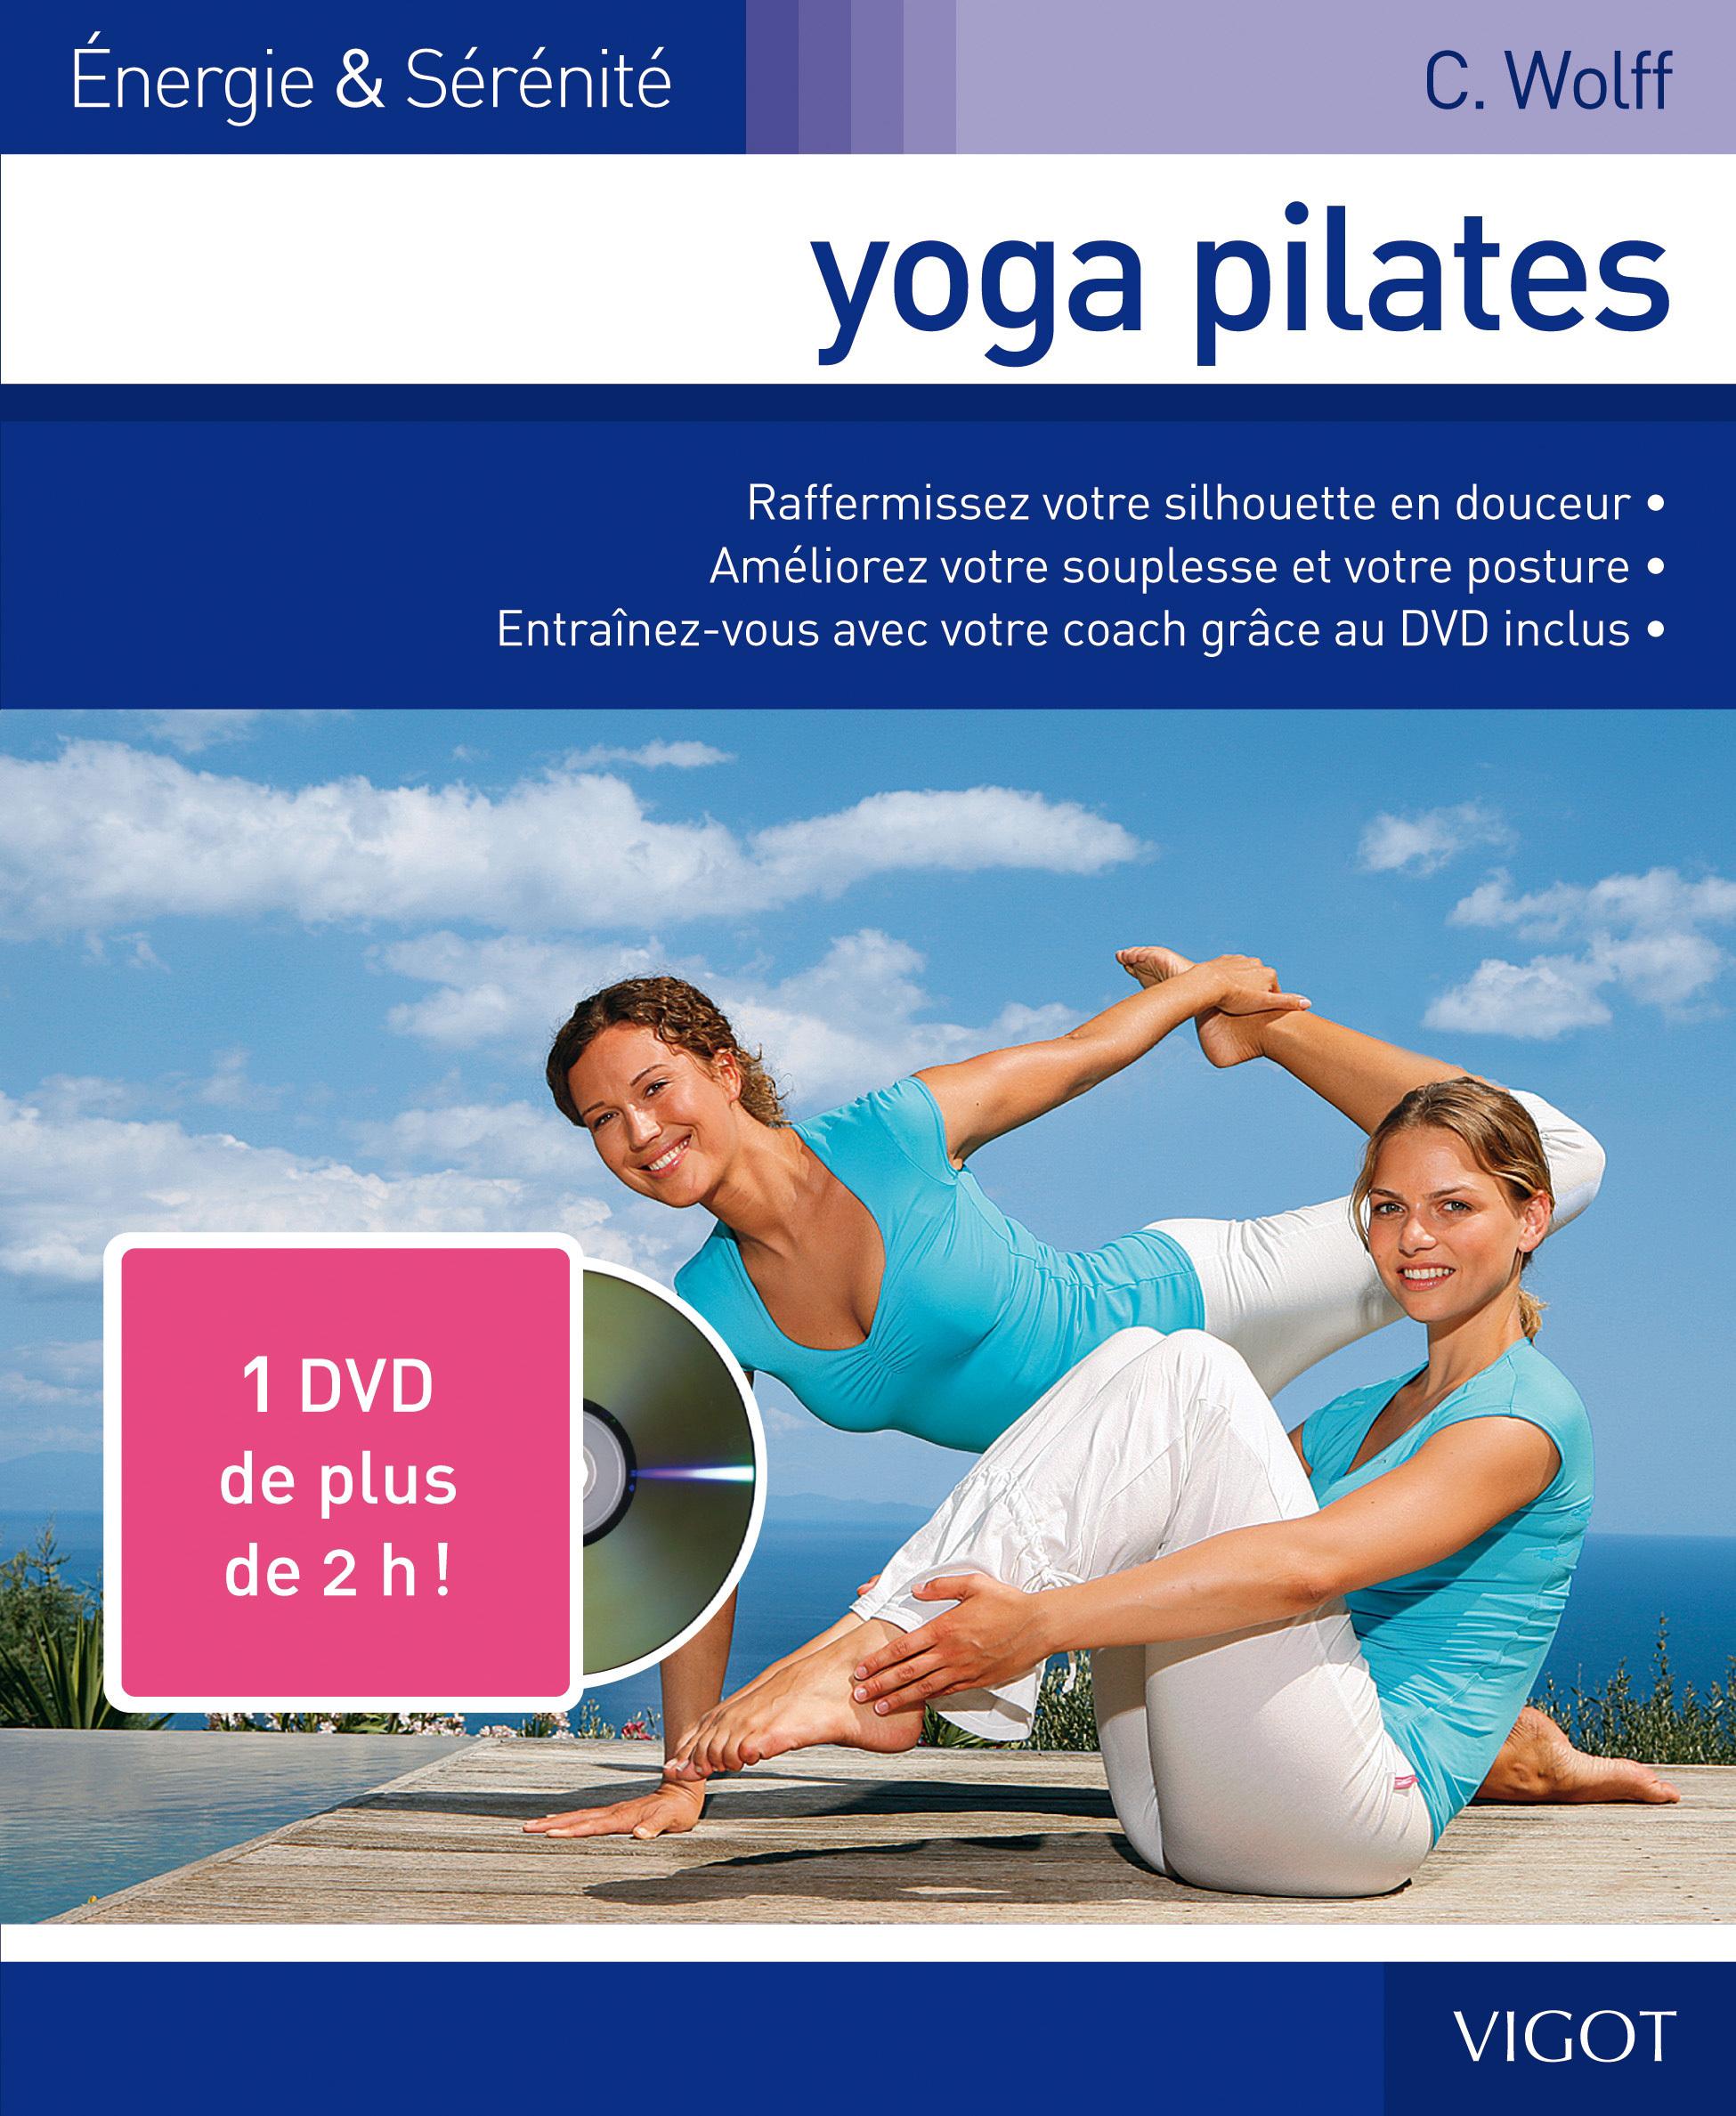 DVD AVEC YOGA PILATES